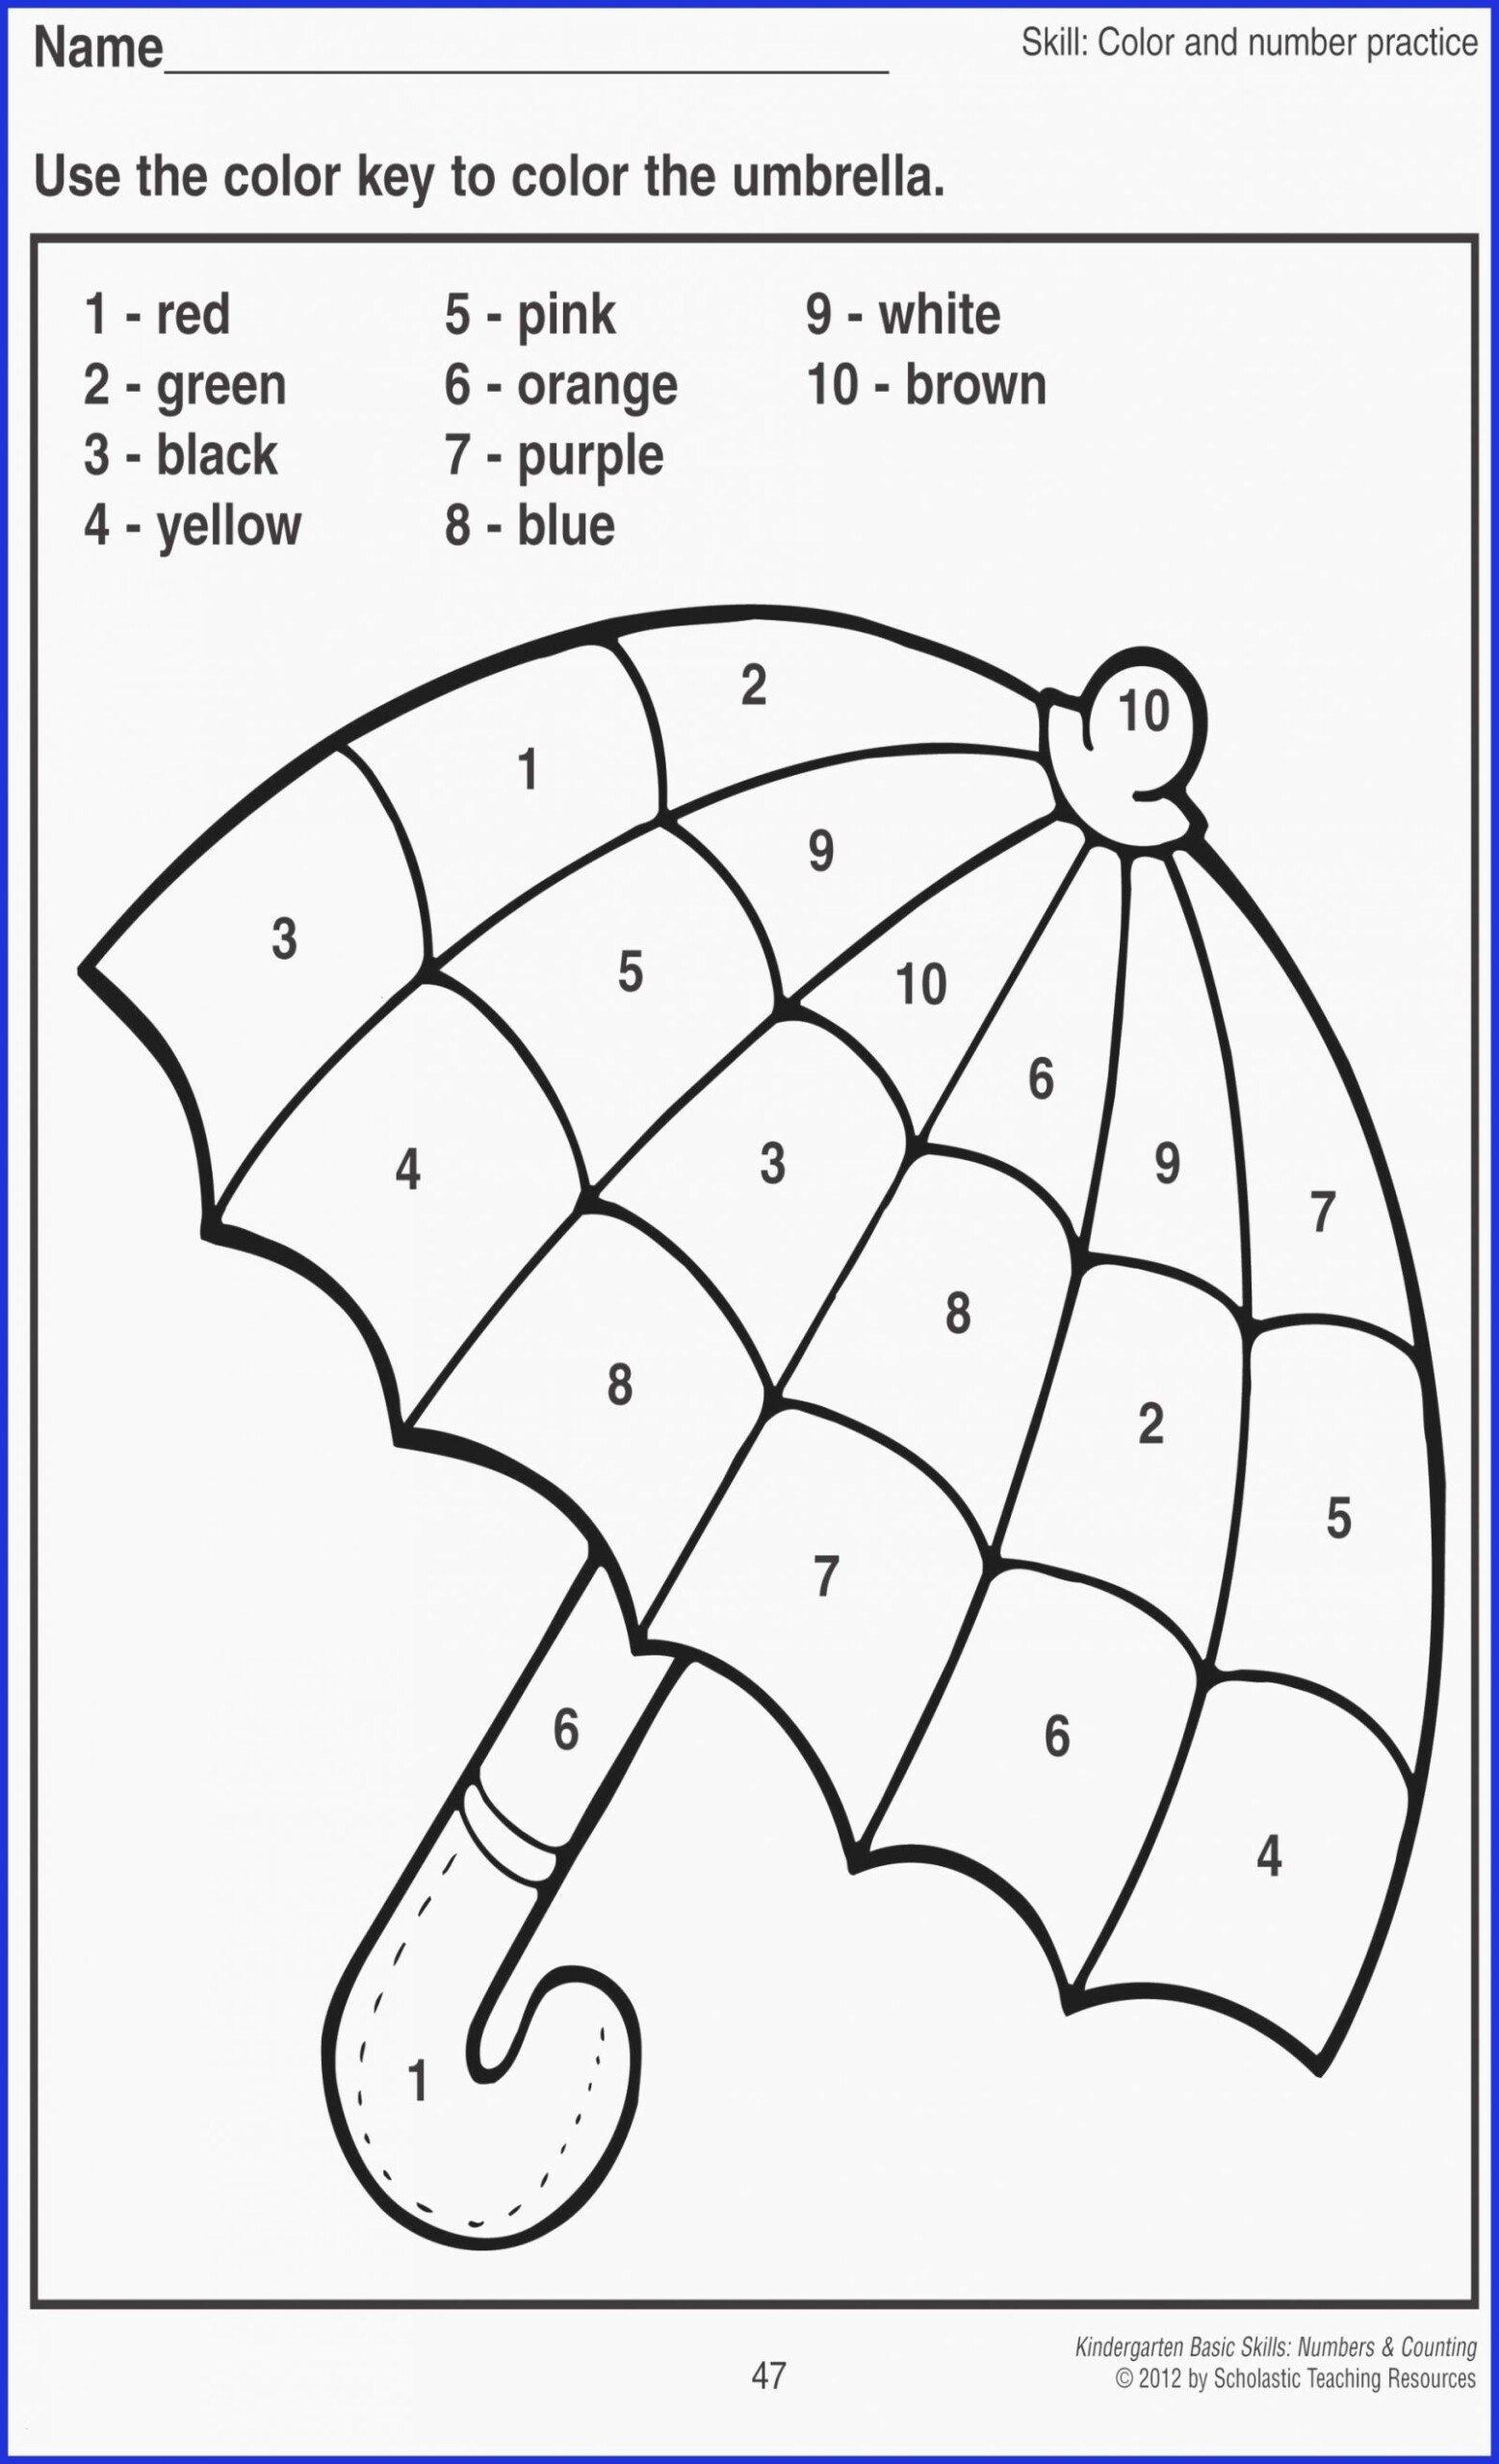 Numbers Worksheets for Preschoolers Free Printables top Free Printable Color by Number Worksheets Coloring Book Easy